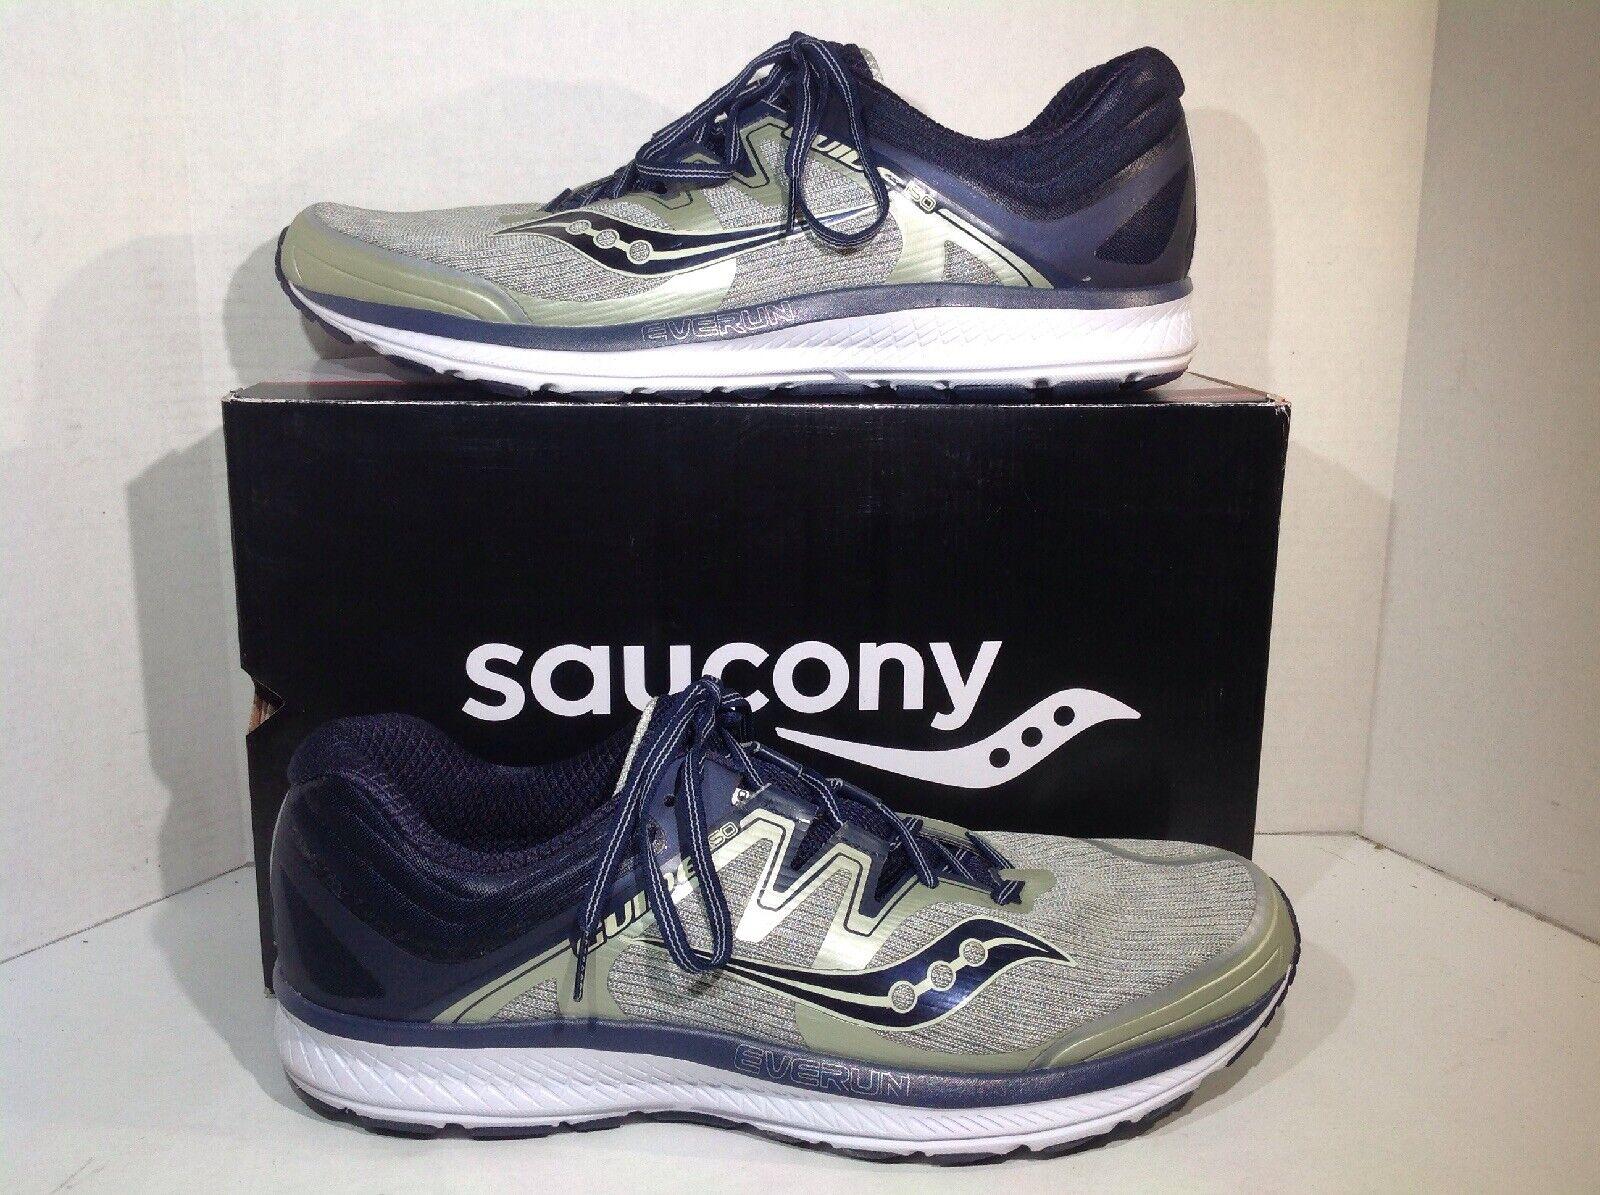 Saucony Para Hombre Guide ISO gris Azul Marino Atléticas Zapatos para correr YC-812